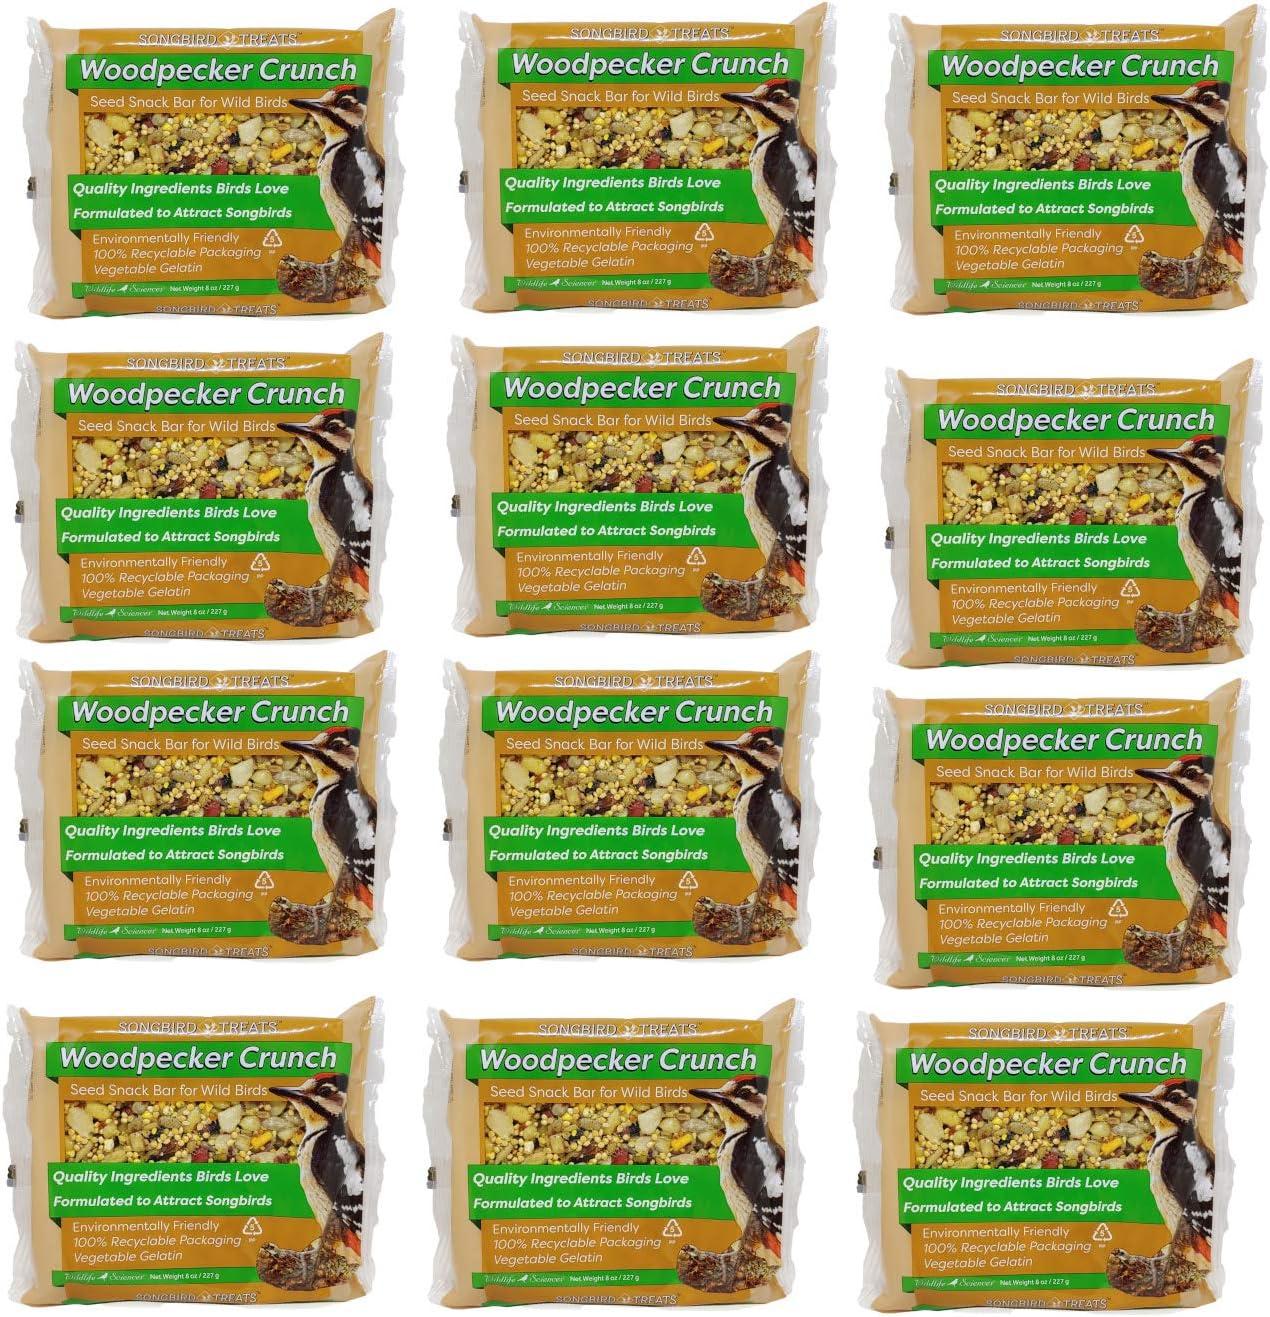 Songbird Treats Seed Bars | 12 Pack of 8 oz Bird Seed Cakes for Wild Birds (Woodpecker Crunch)